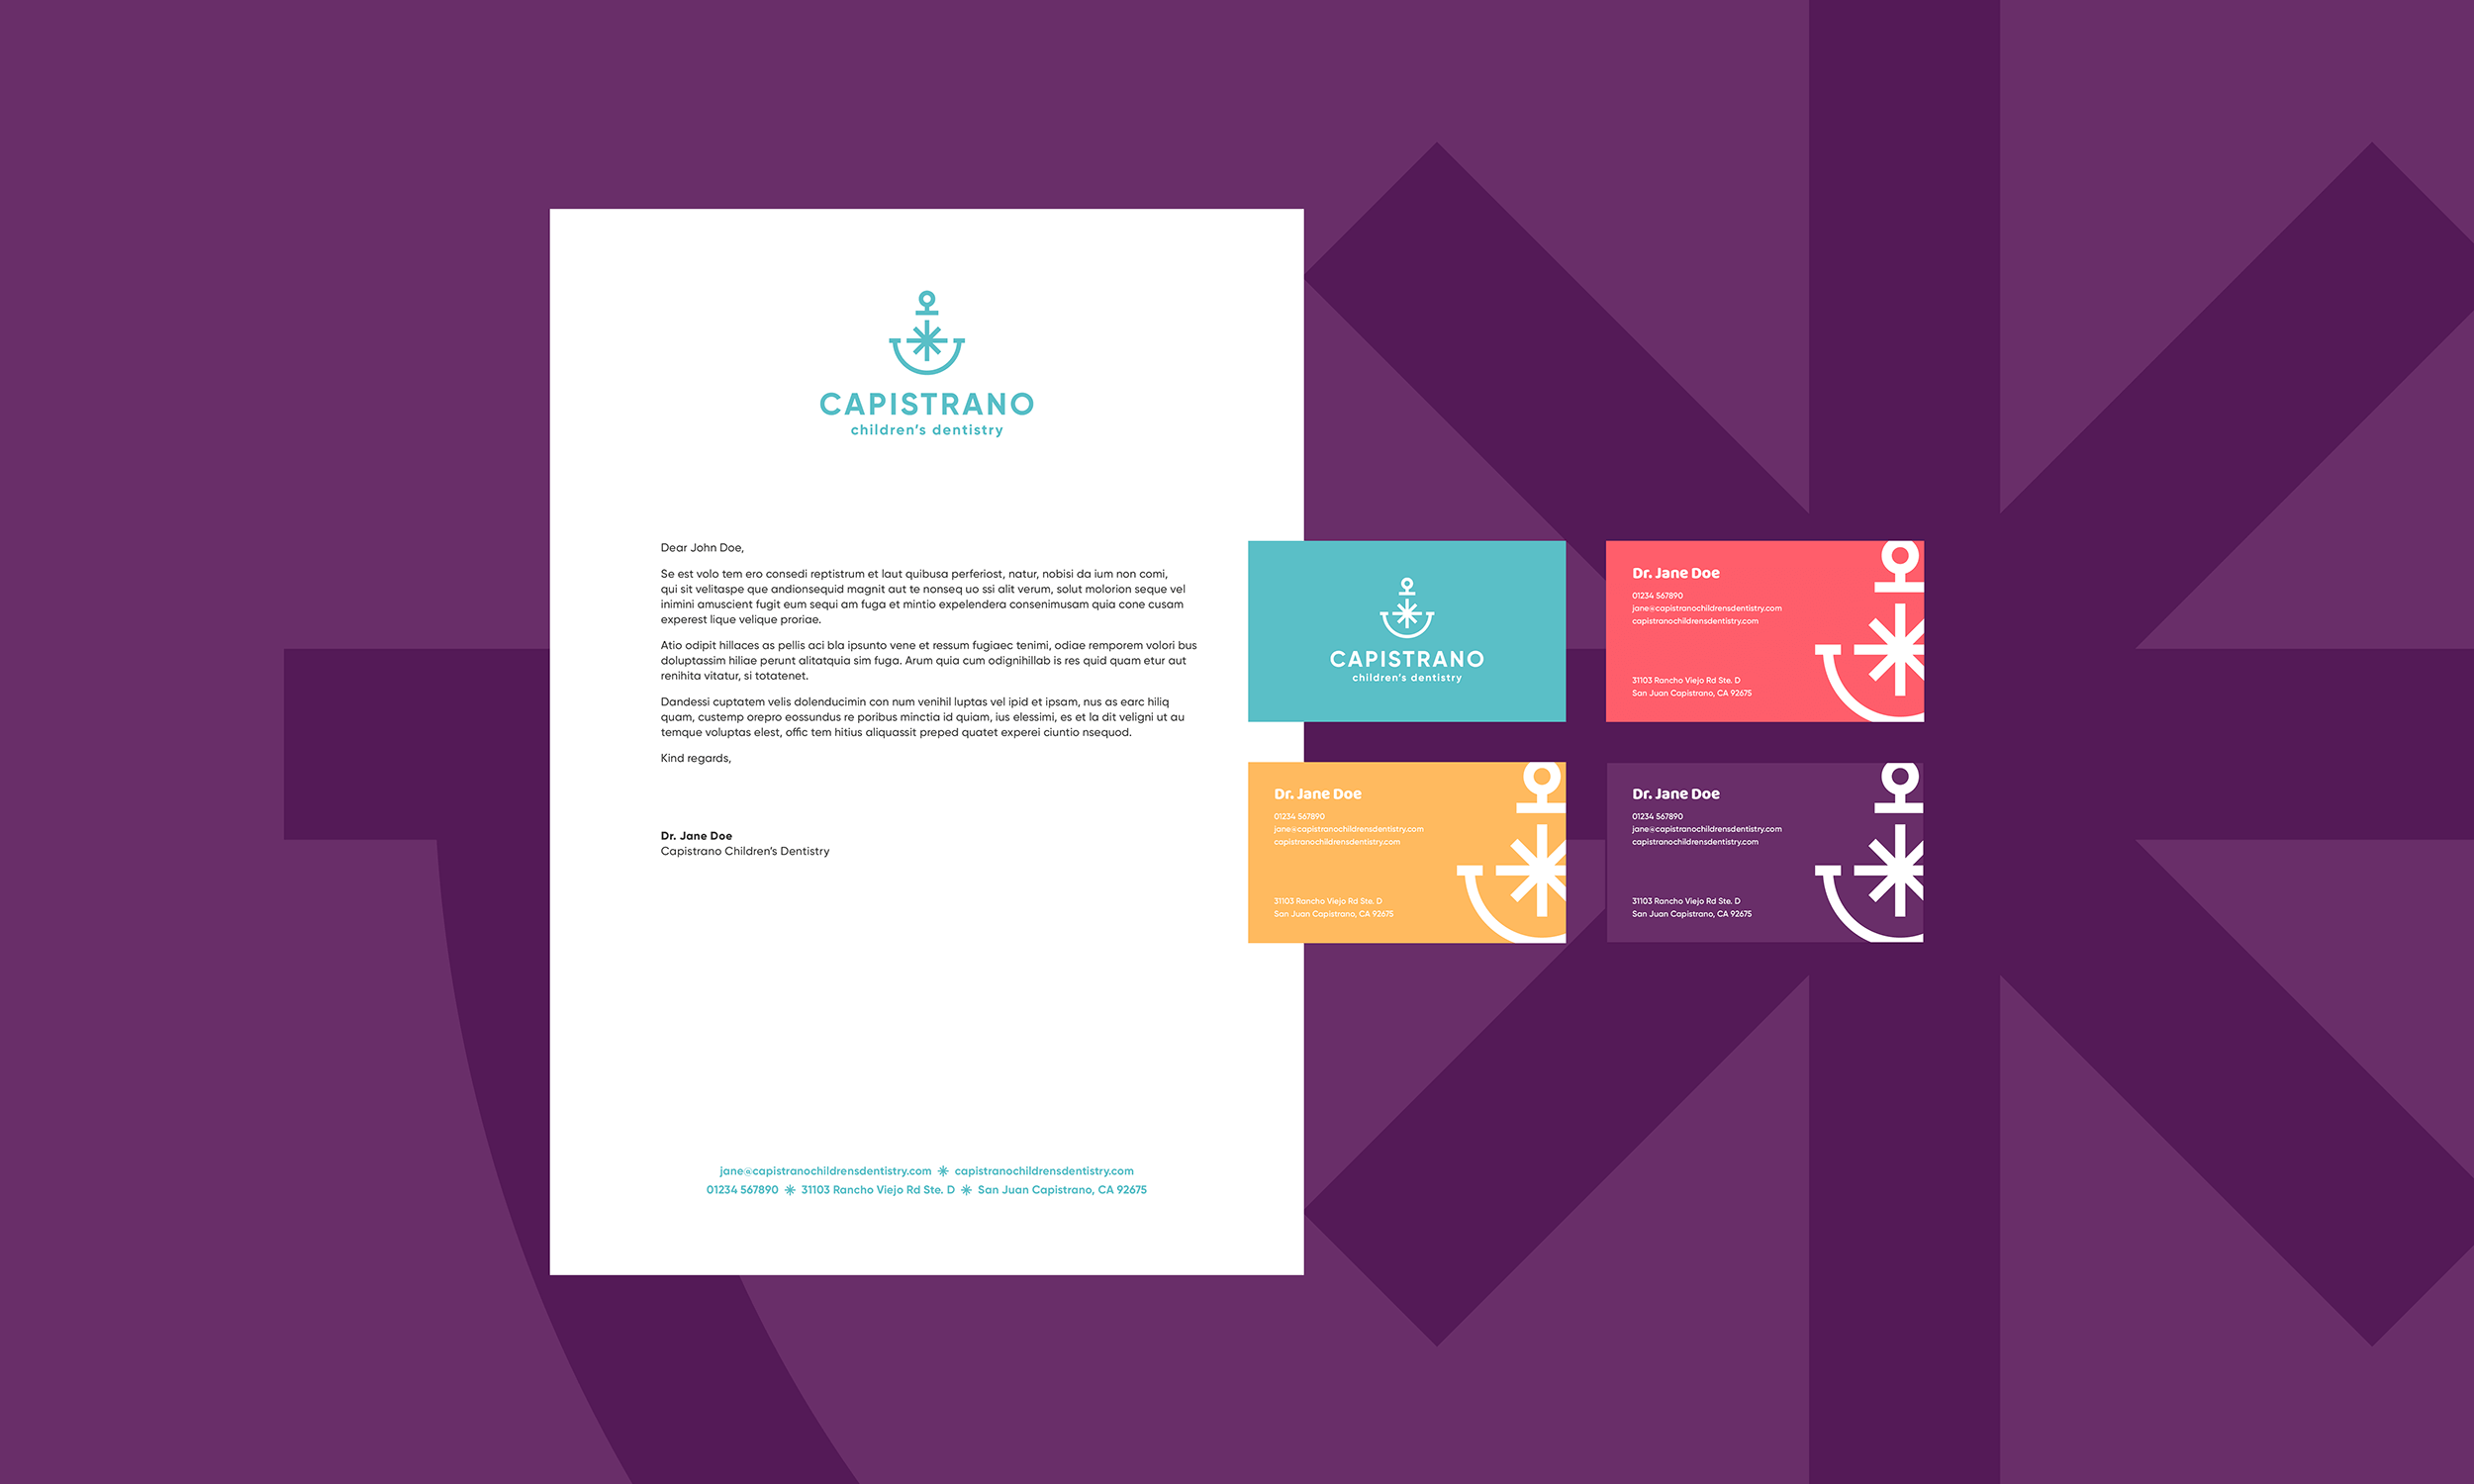 Capistrano-Childrens-Dentistry-Logo-Design-Freelance-Graphic-Designer-Margate-Kent-Presentation-Pediatric-Dental-Business-Cards